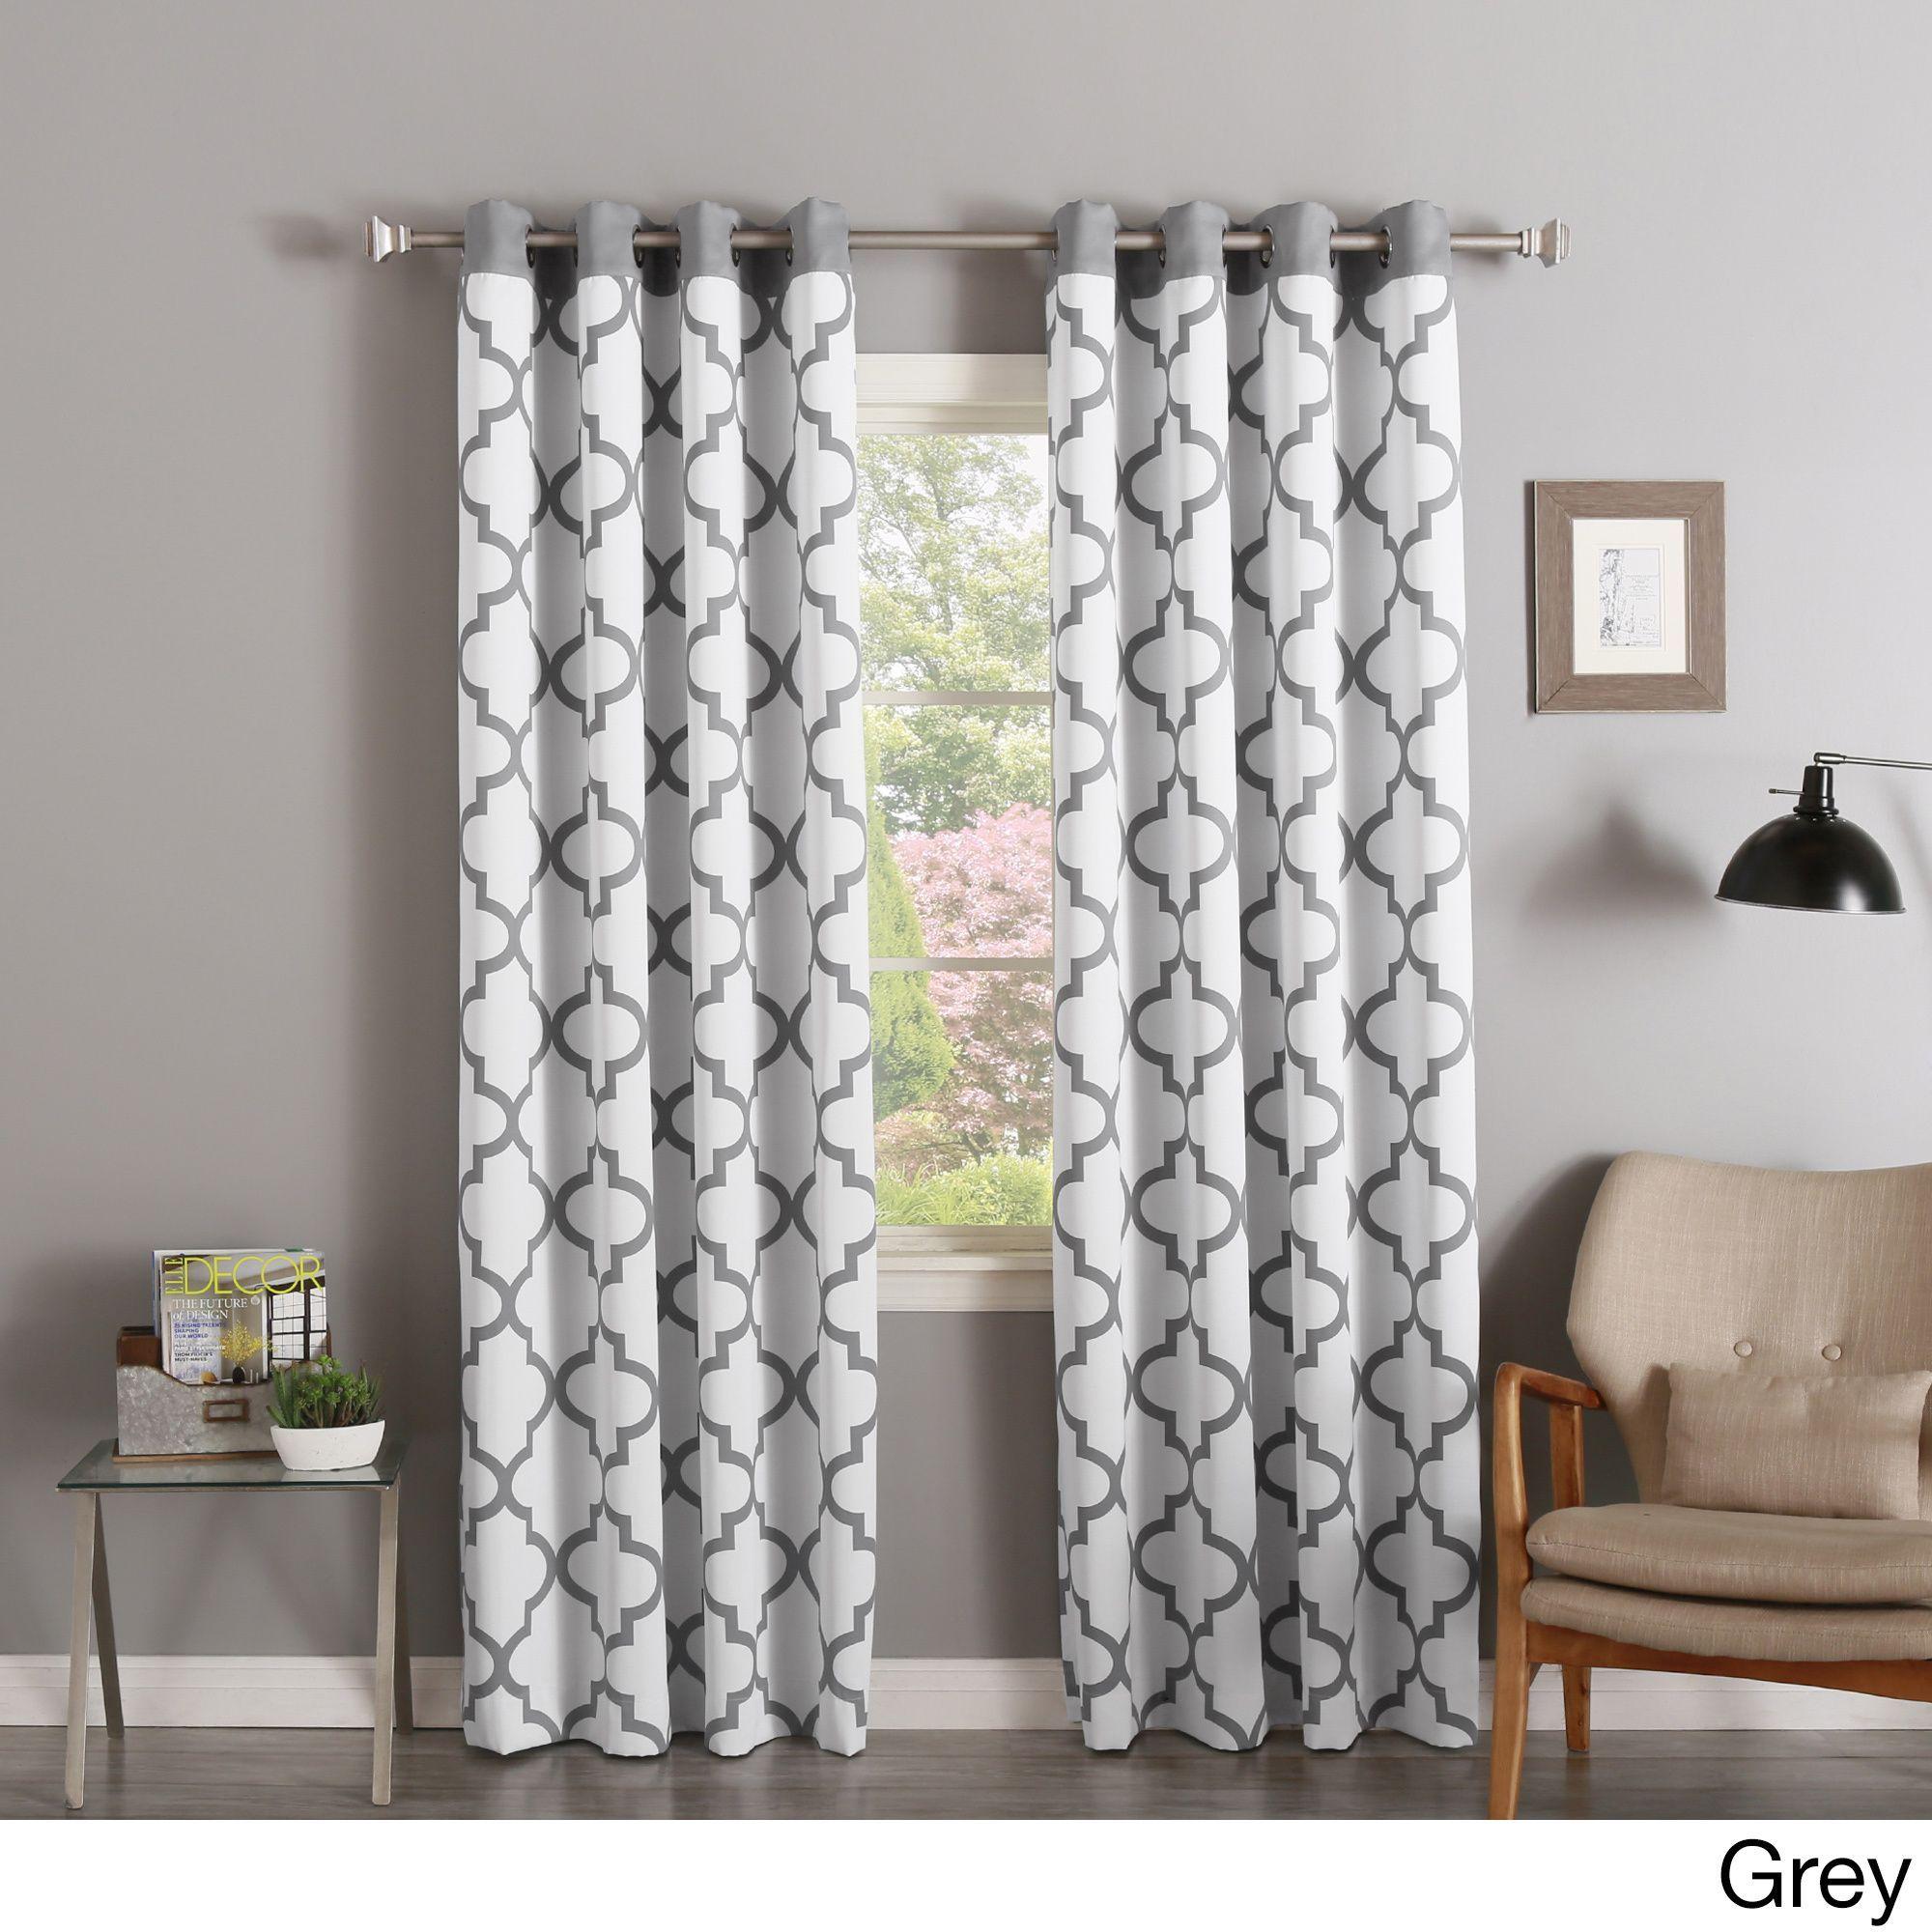 Aurora home moroccan tile print room darkening grommet top curtain